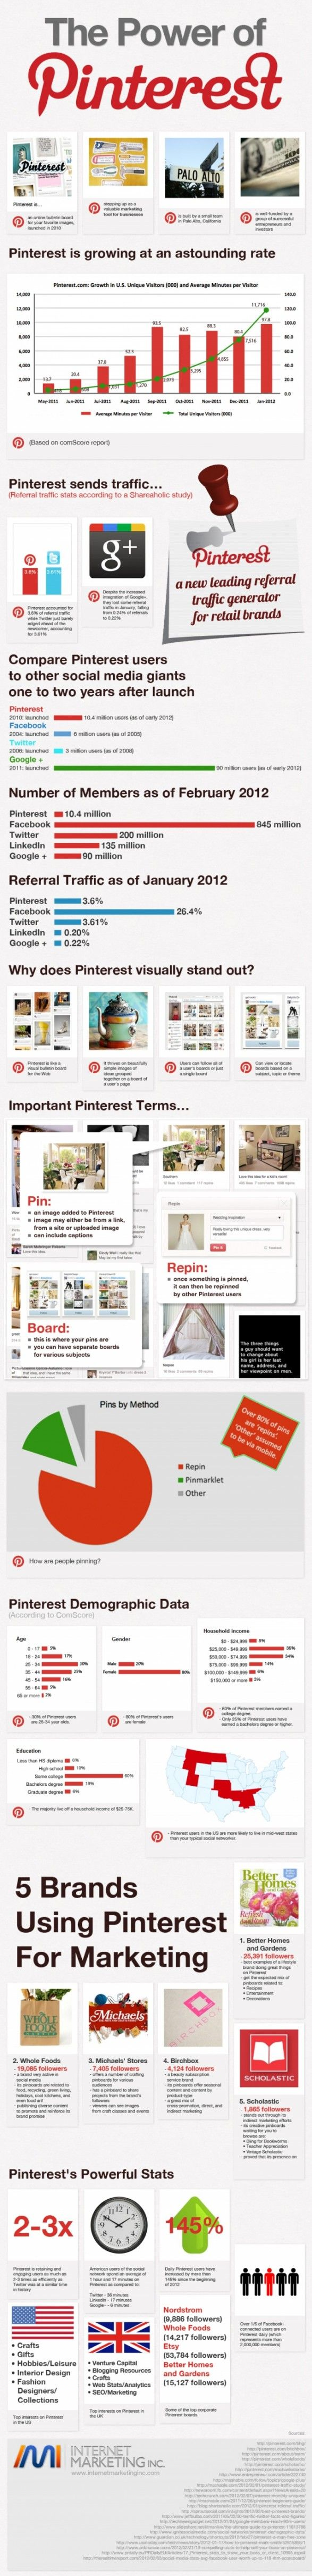 131 best Assist Social Media images on Pinterest | Social networks ...